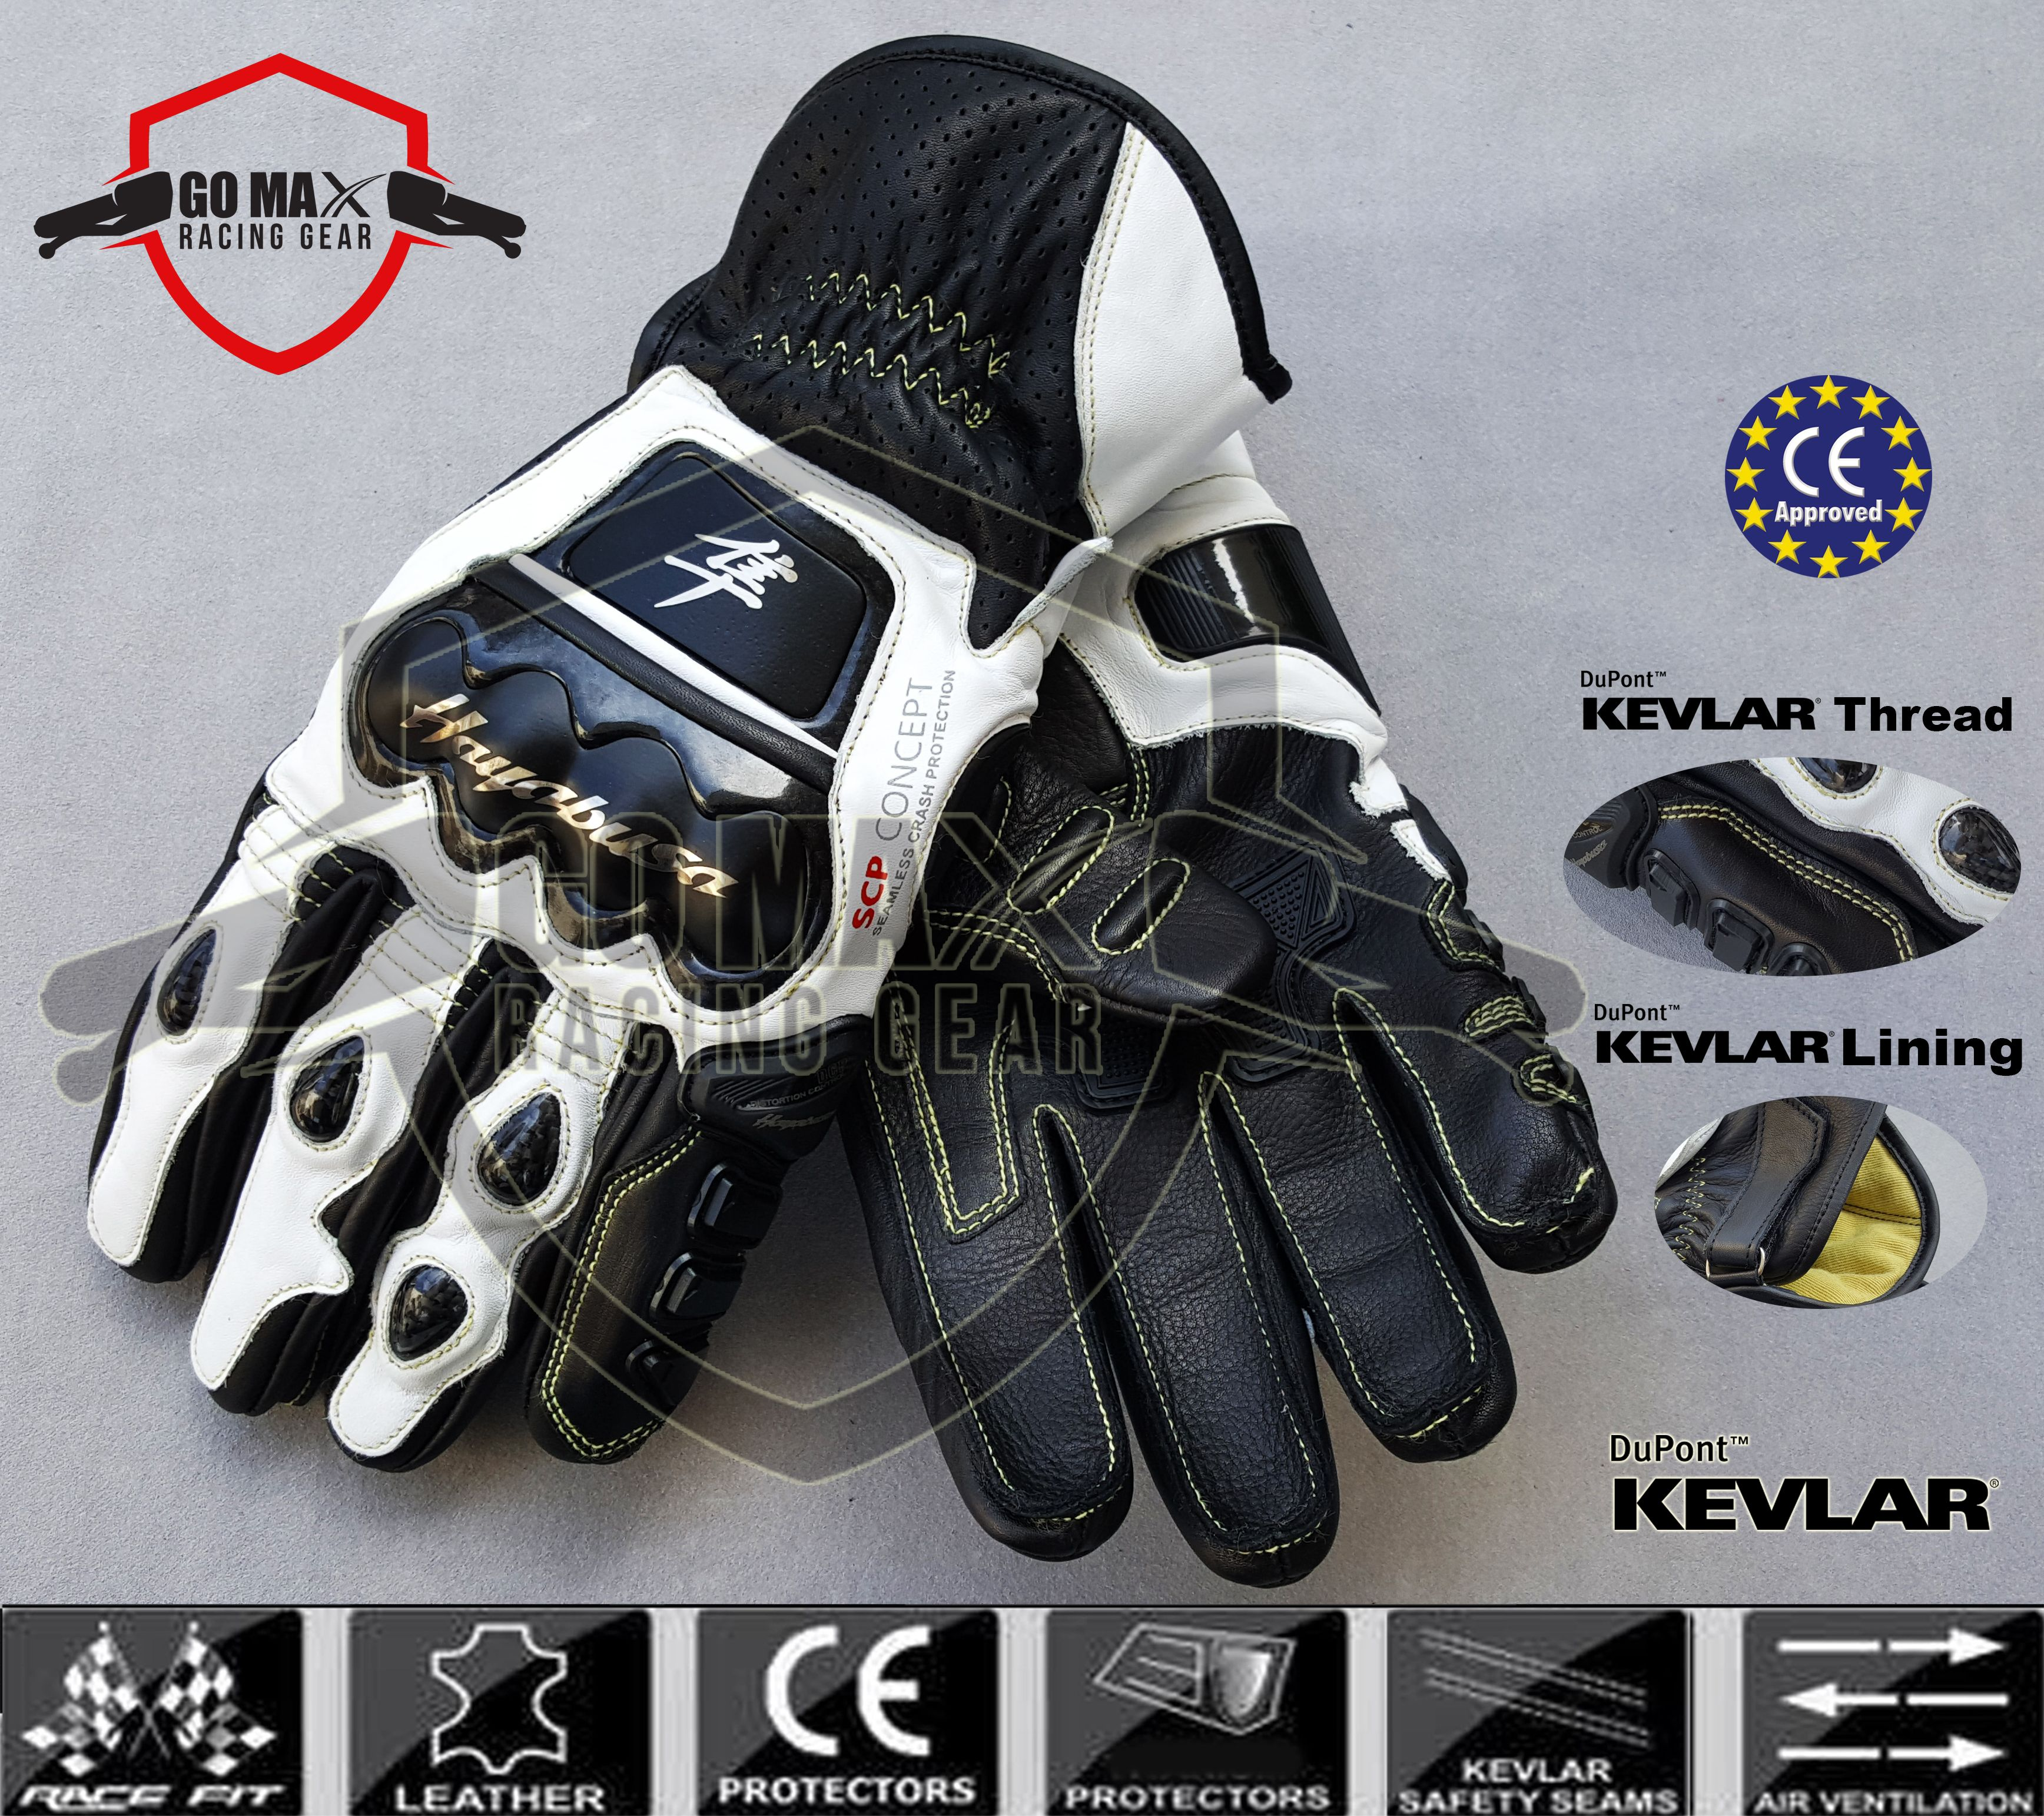 Suzuki Hayabusa Short Leather Racing Gloves Features Soft Inserts Microelastic Elasticated Inserts Elas Motorbike Leathers Leather Protector Suzuki Hayabusa